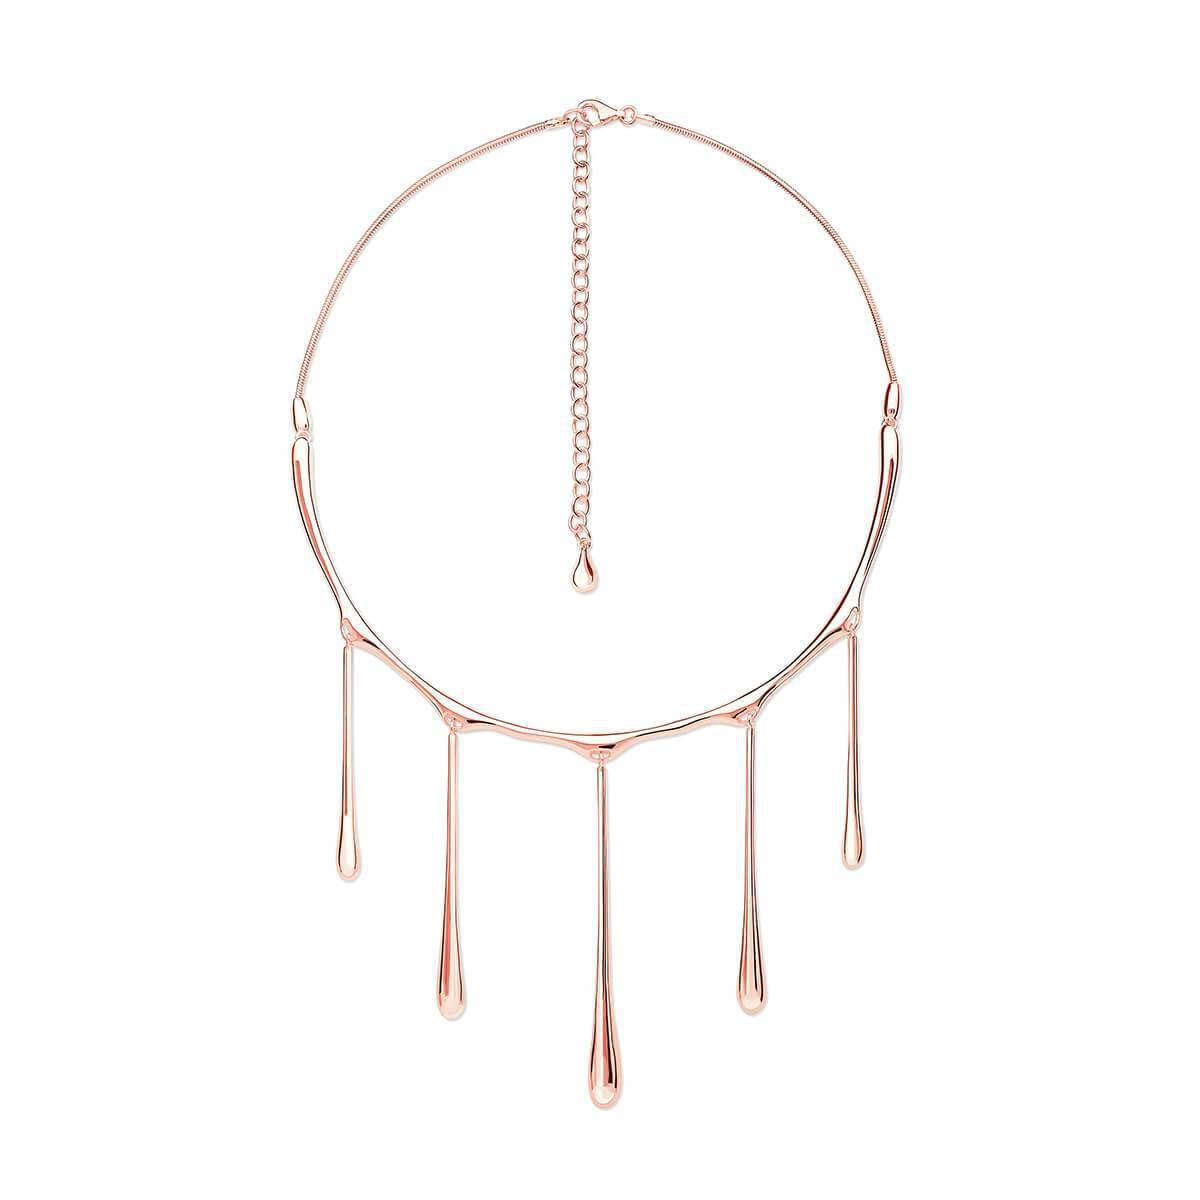 Lucy Quartermaine Dancing Drop Necklace U7lFB